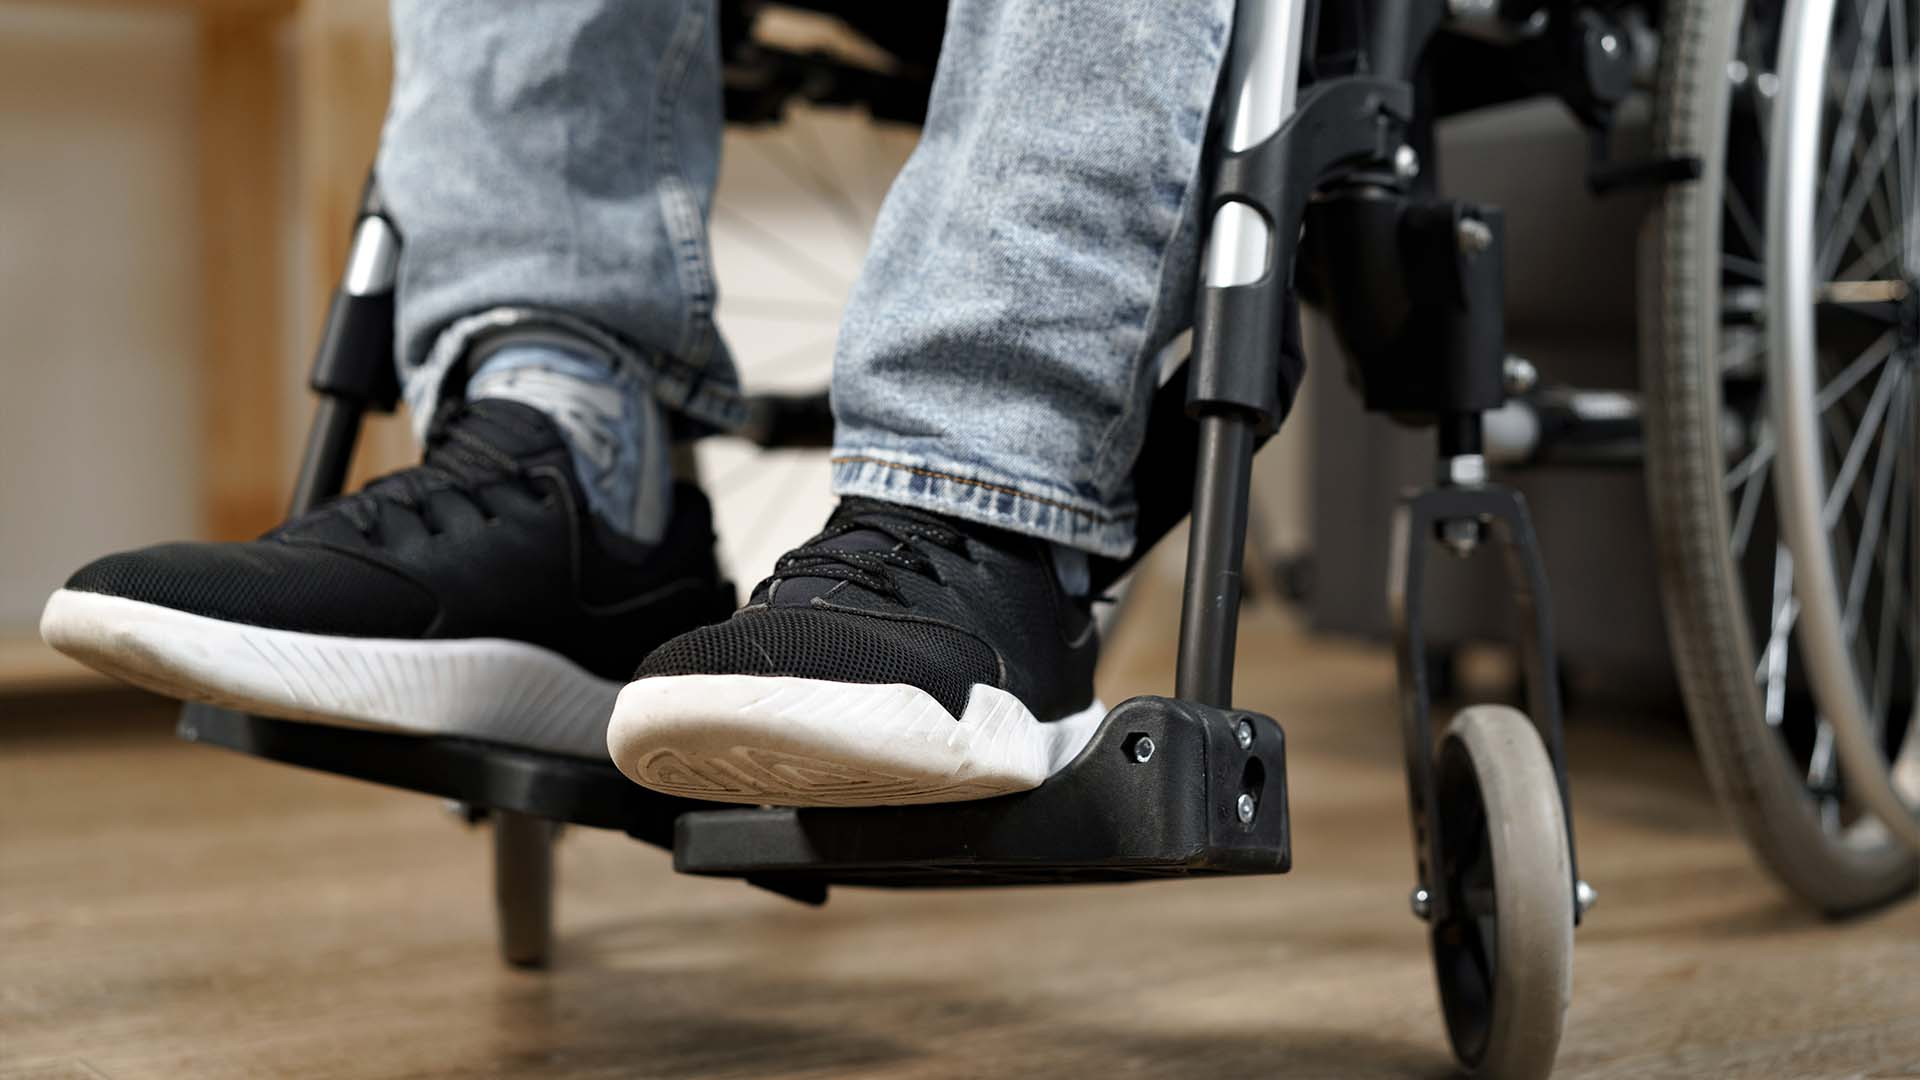 sillas eléctricas para minusválidos